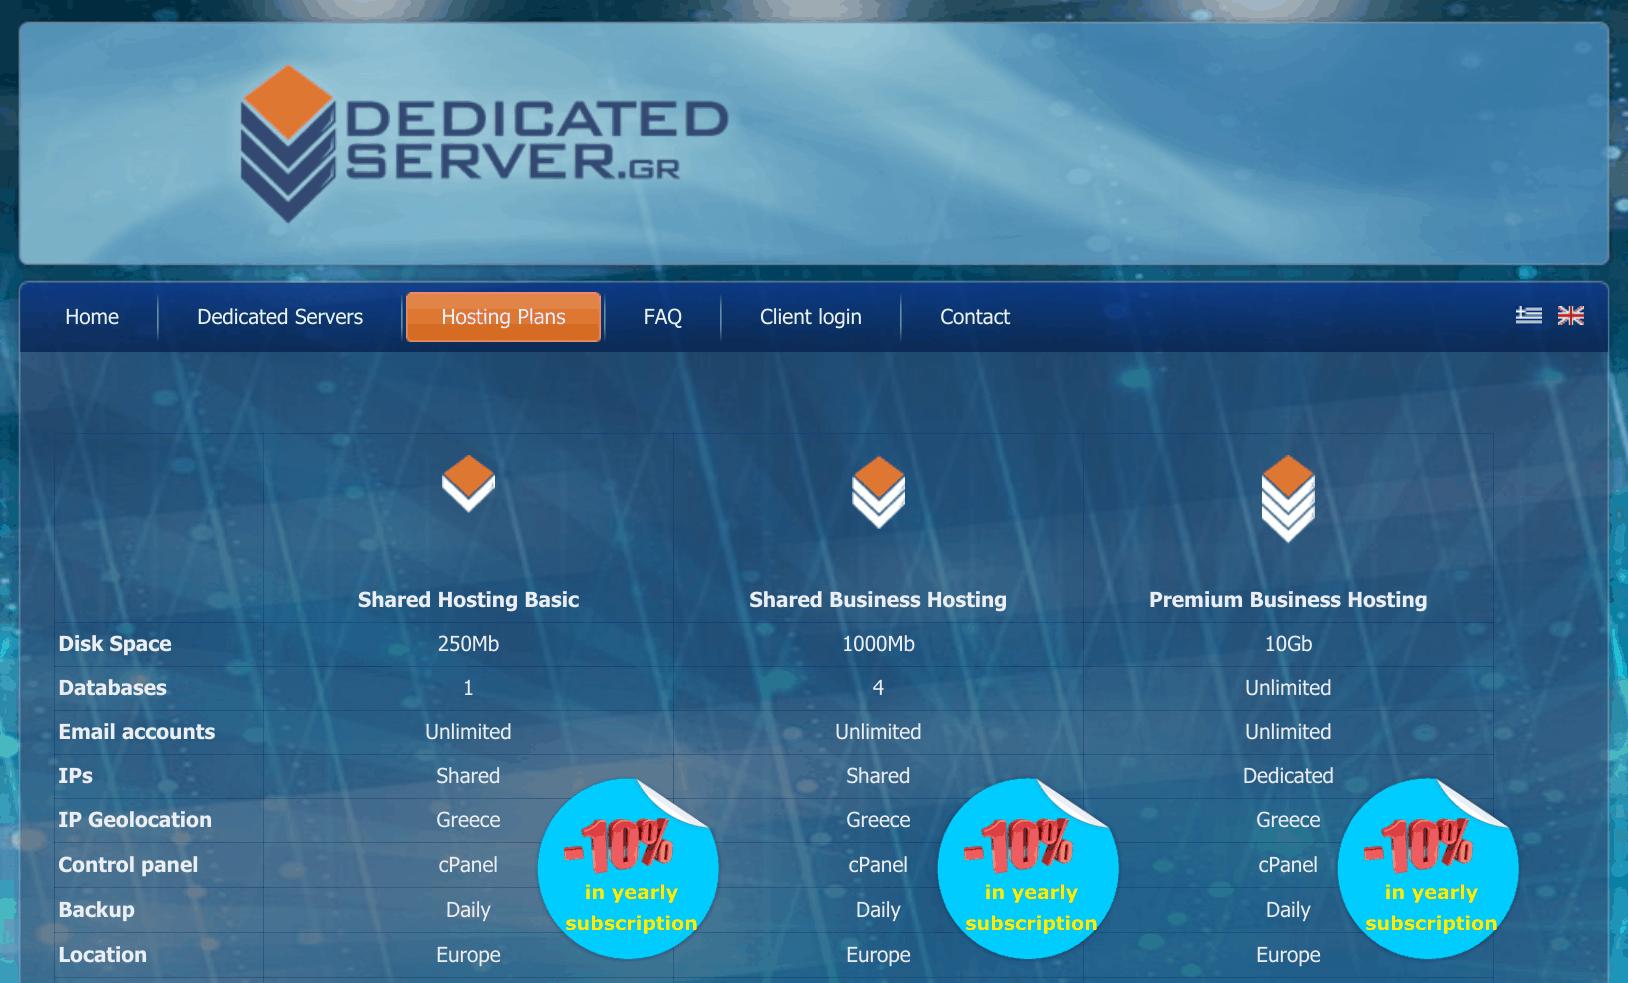 Dedicated-server.gr